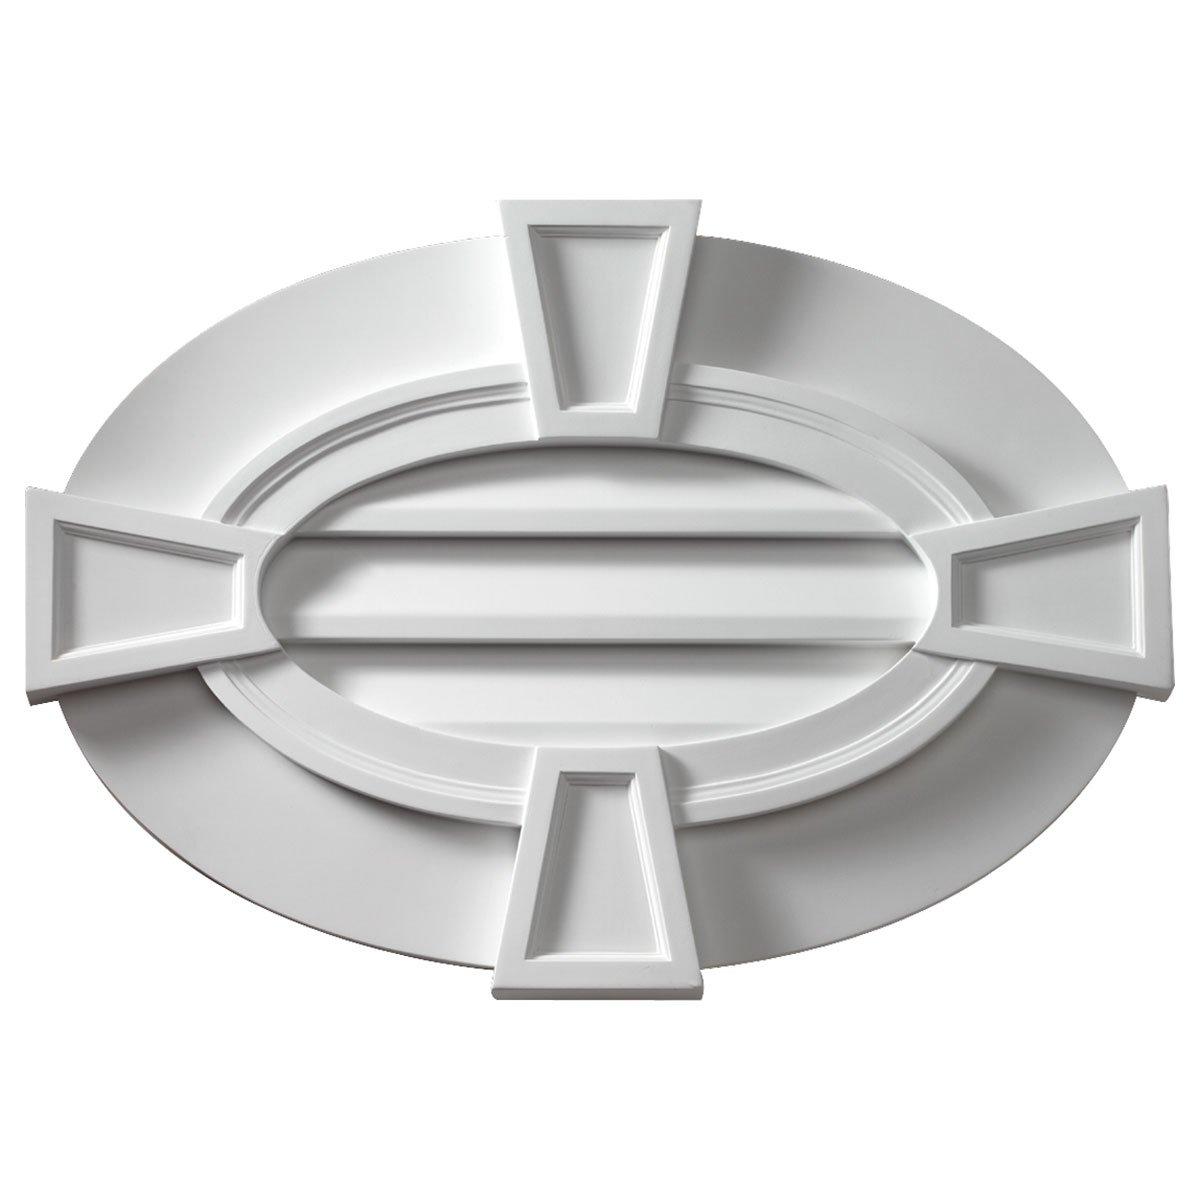 Fypon OVLV29X20TK 29''W x 20''H Oval Louver, Horizontal with Flat trim & Keystones, Decorative